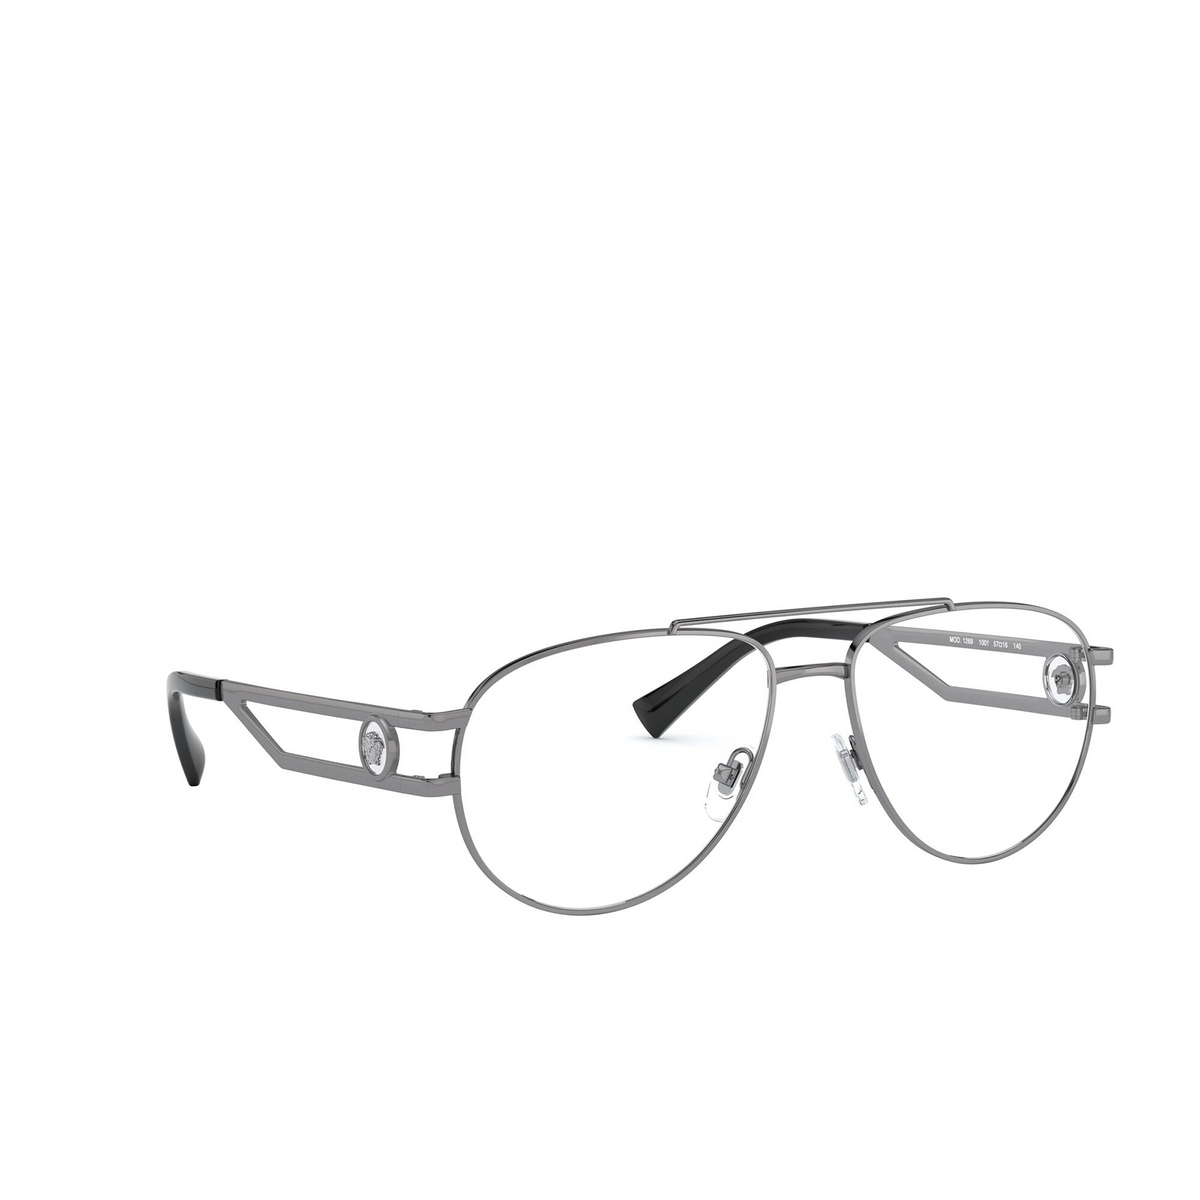 Versace® Aviator Eyeglasses: VE1269 color Gunmetal 1001 - three-quarters view.